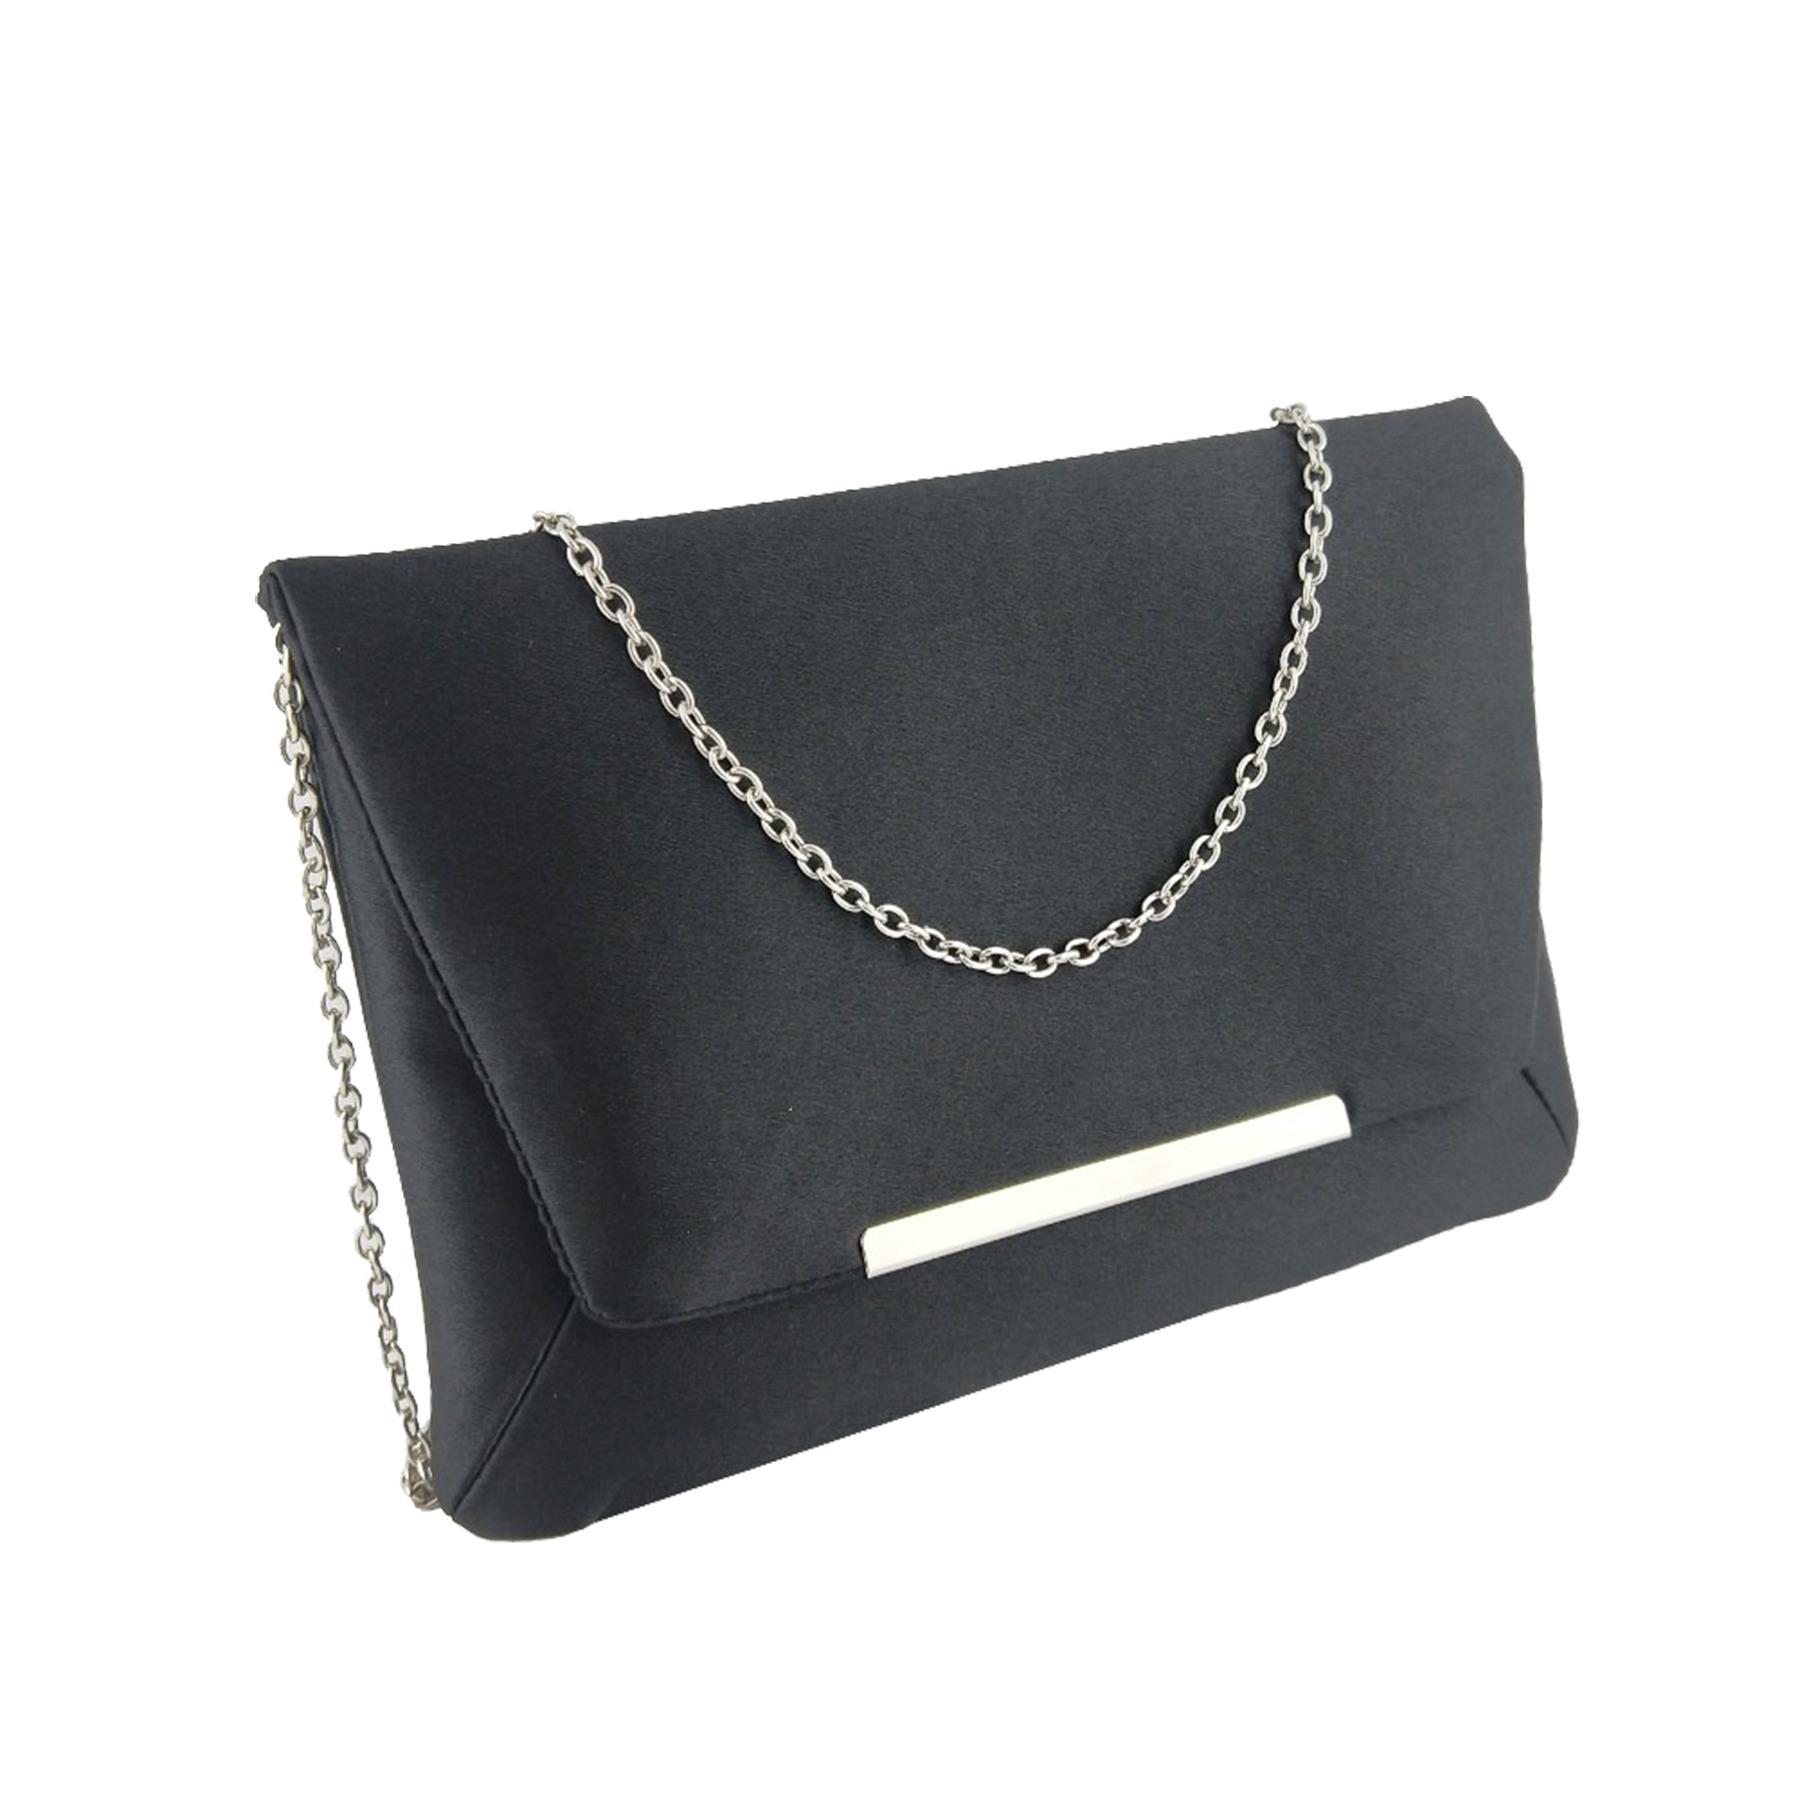 New-Ladies-Satin-Envelope-Metallic-Trim-Bridal-Wedding-Prom-Clutch-Bag thumbnail 3